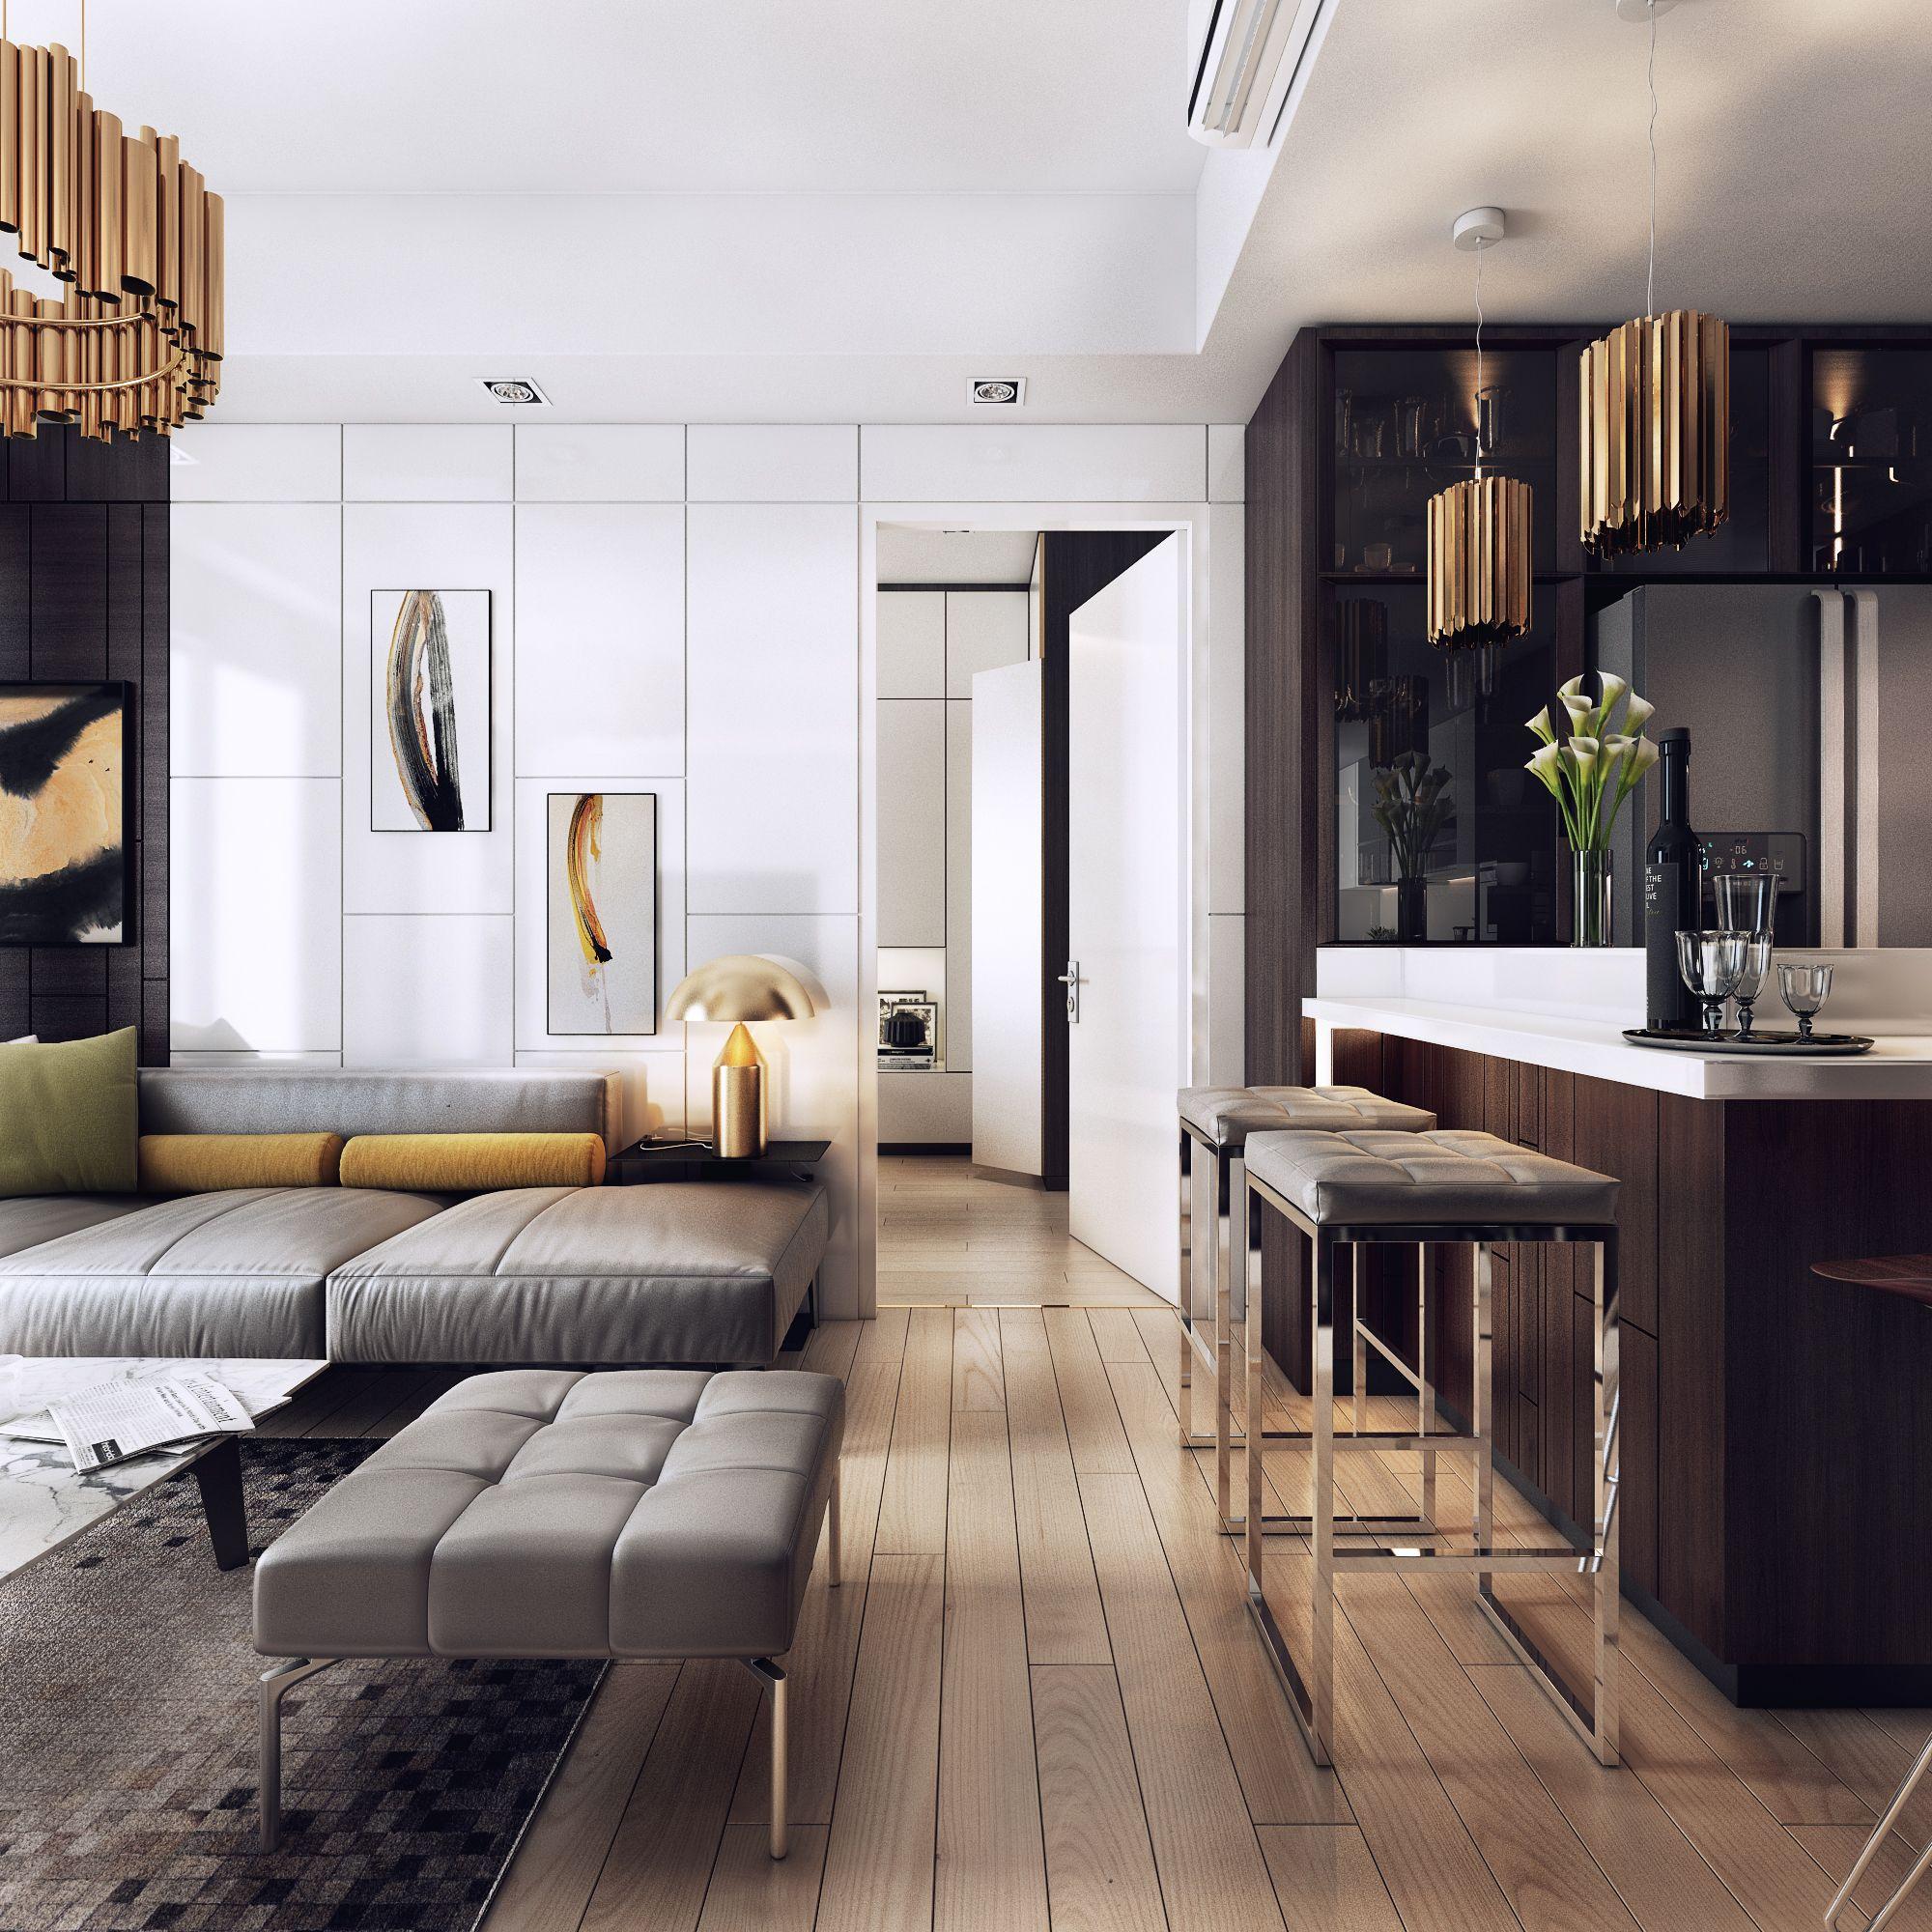 10 Ultra Luxury Apartment Interior Design Ideas Modern